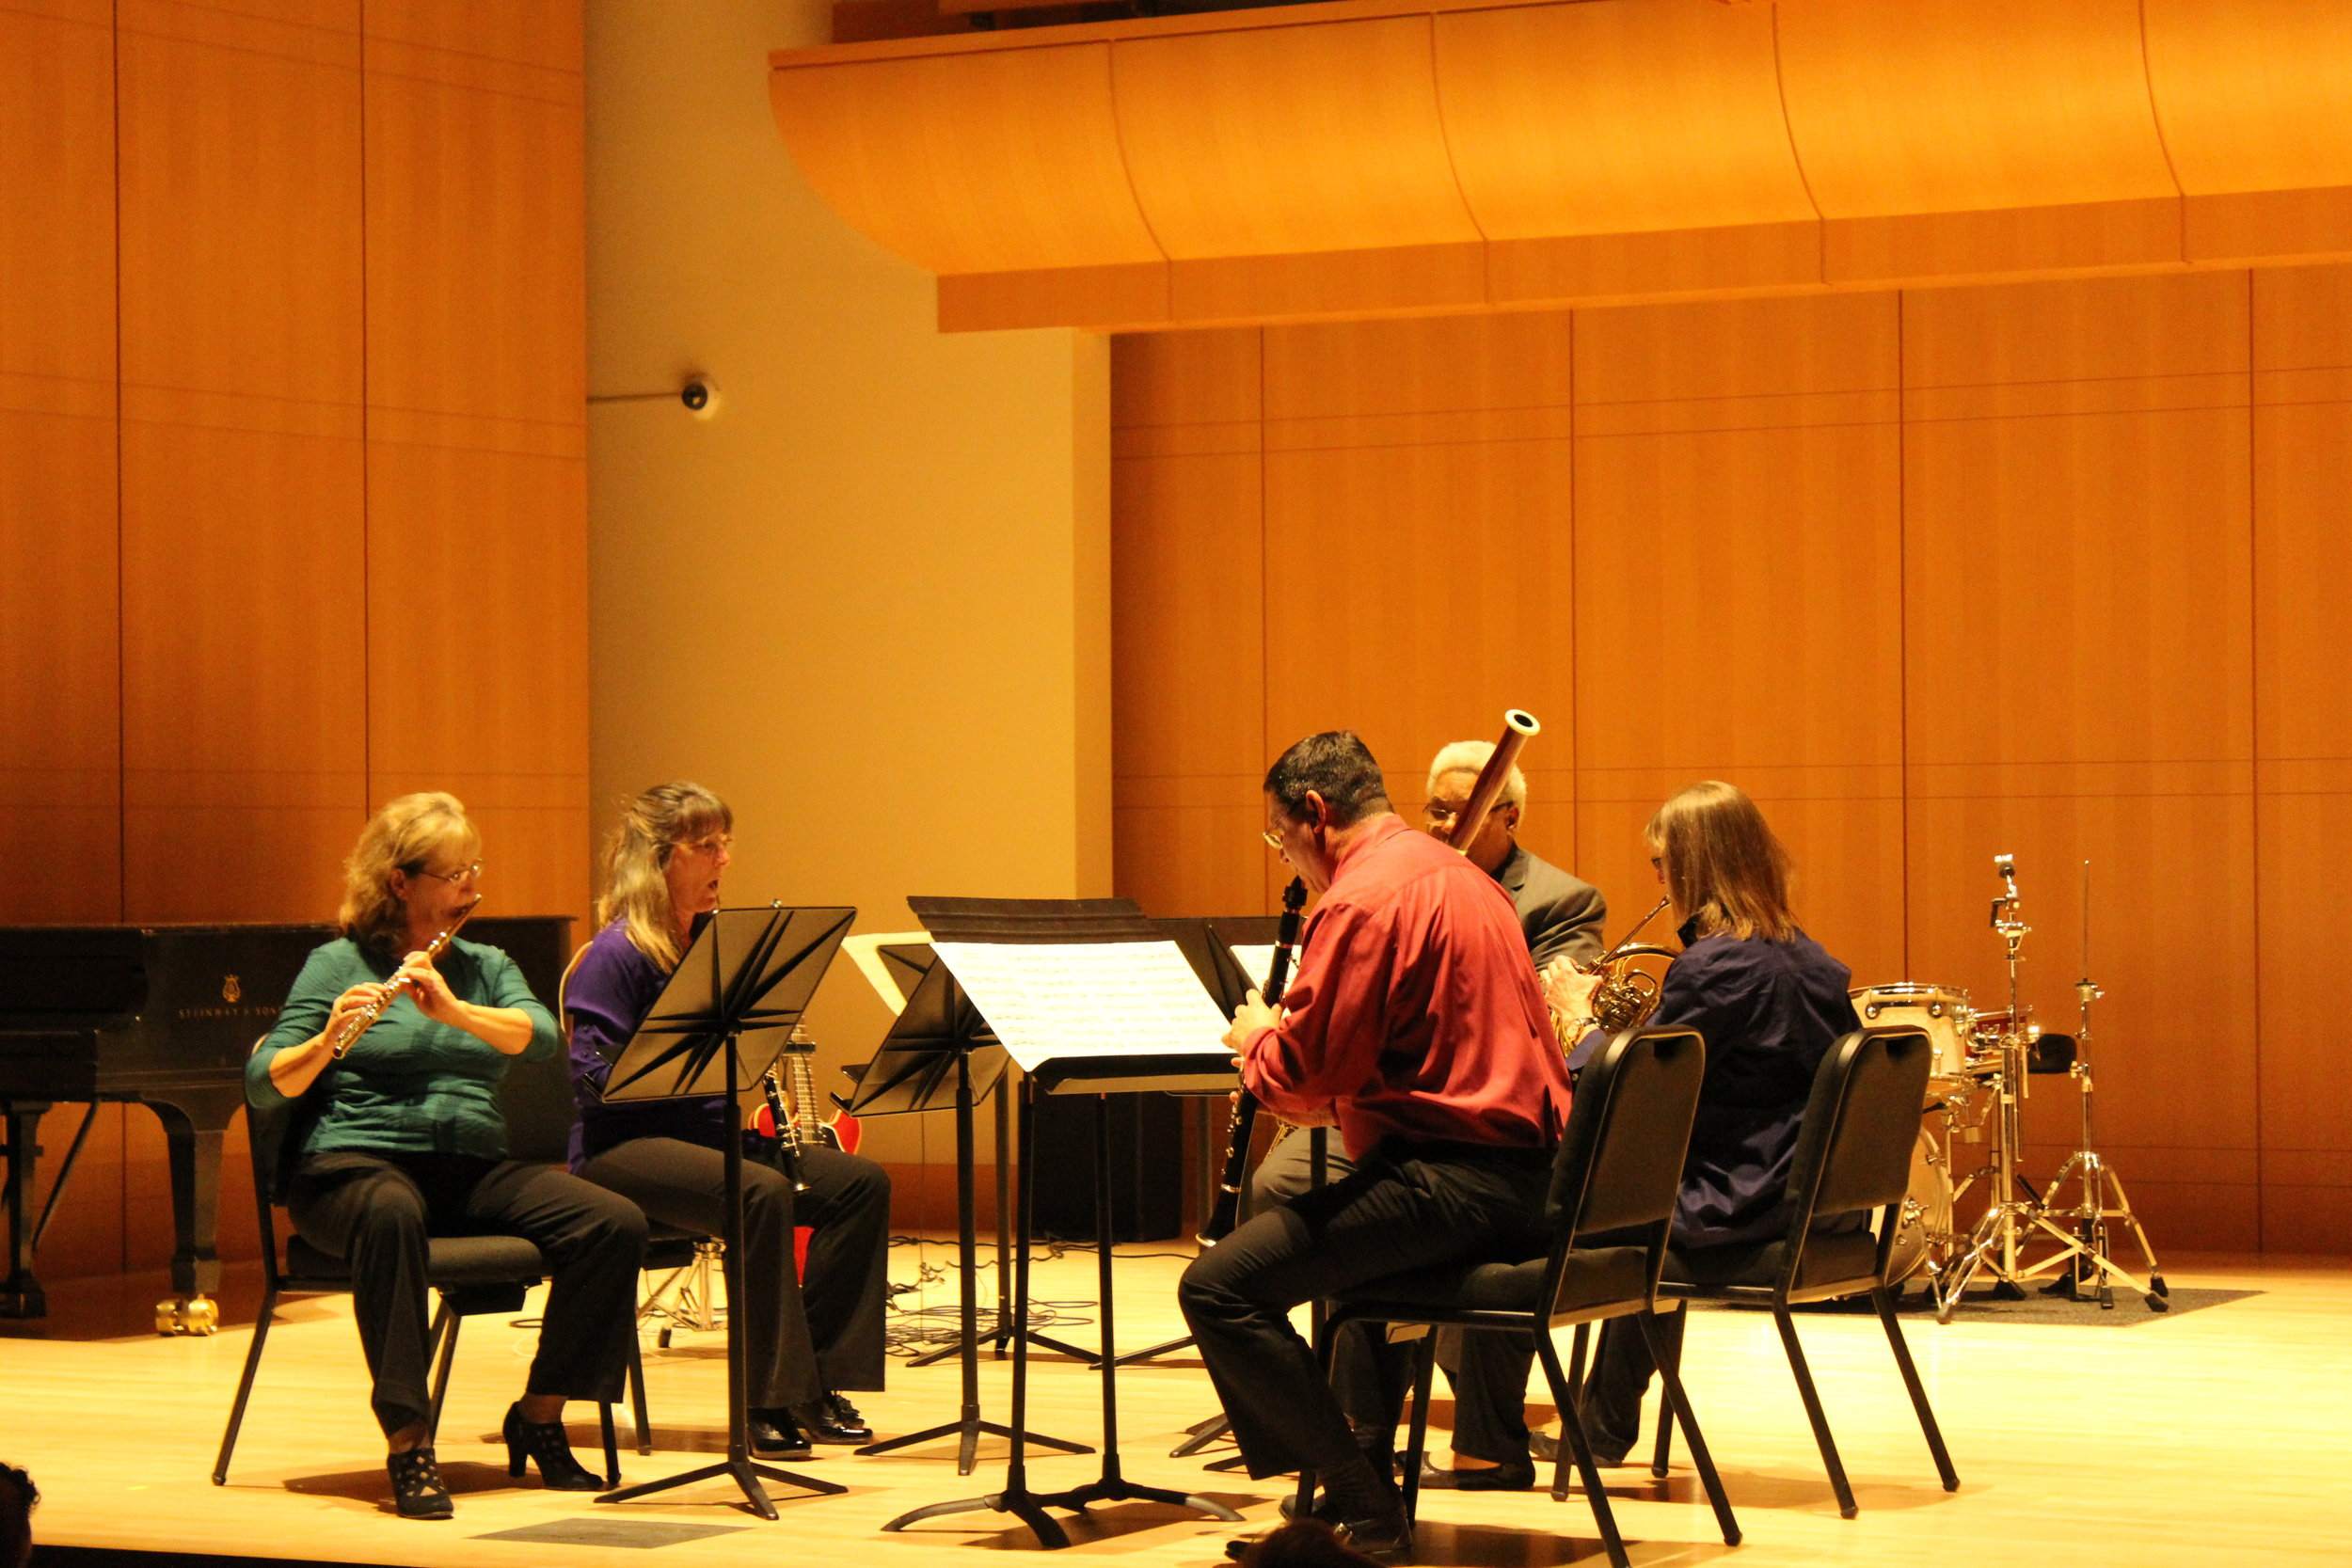 faculty-composers-concert-jade-eriksson_32475449443_o.jpg